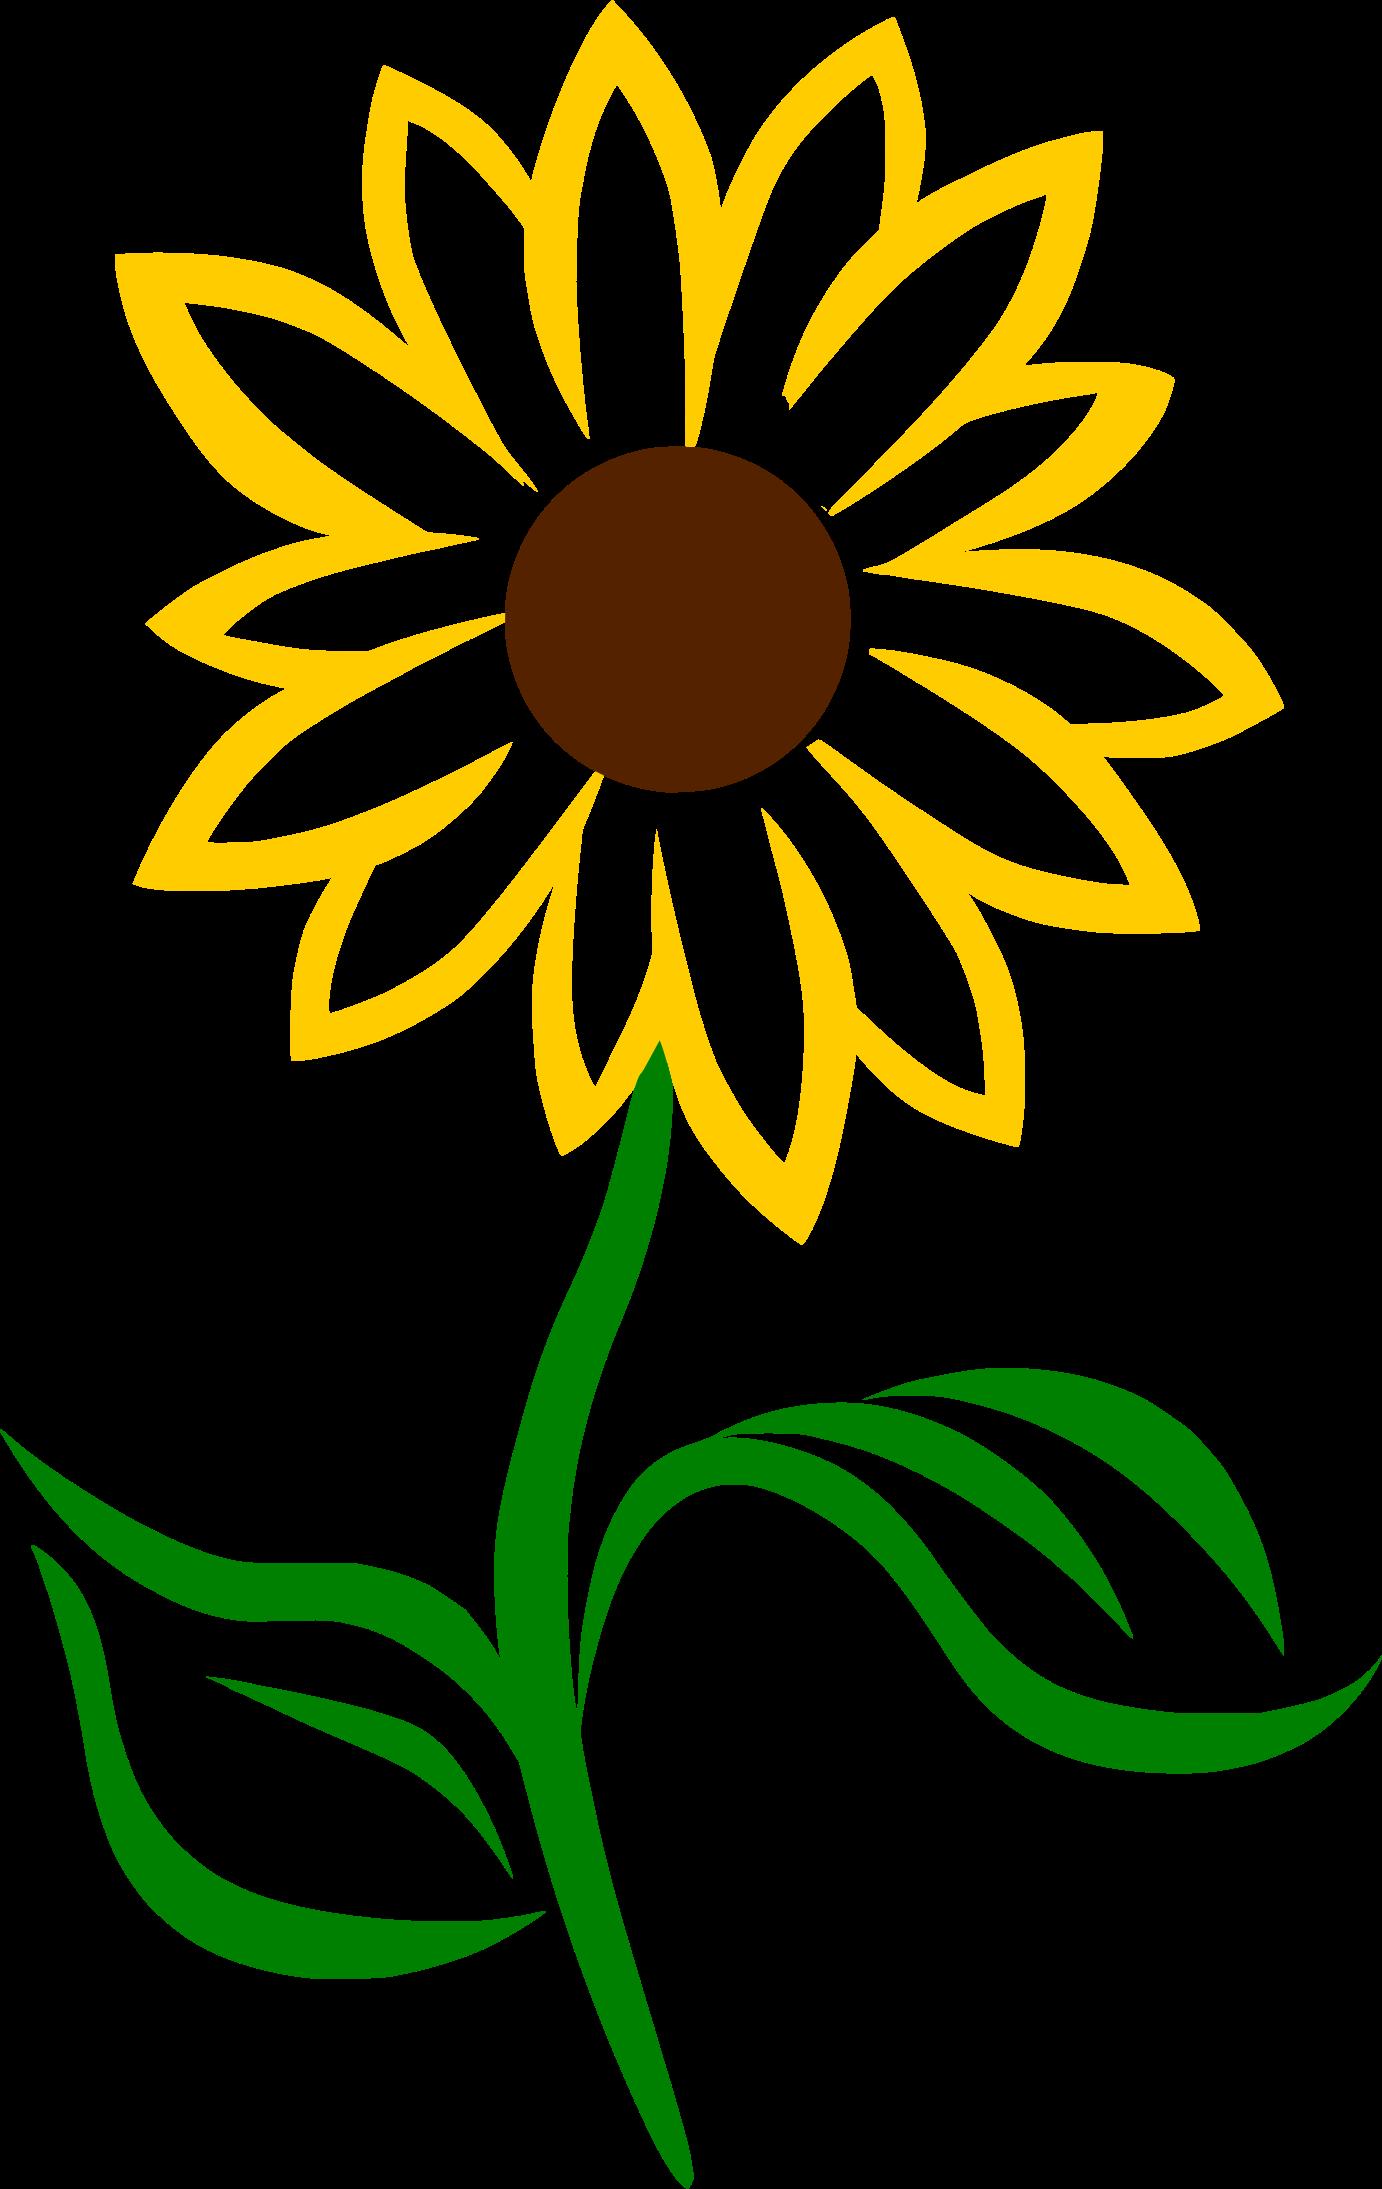 41+ Free sunflower svg cut files ideas in 2021